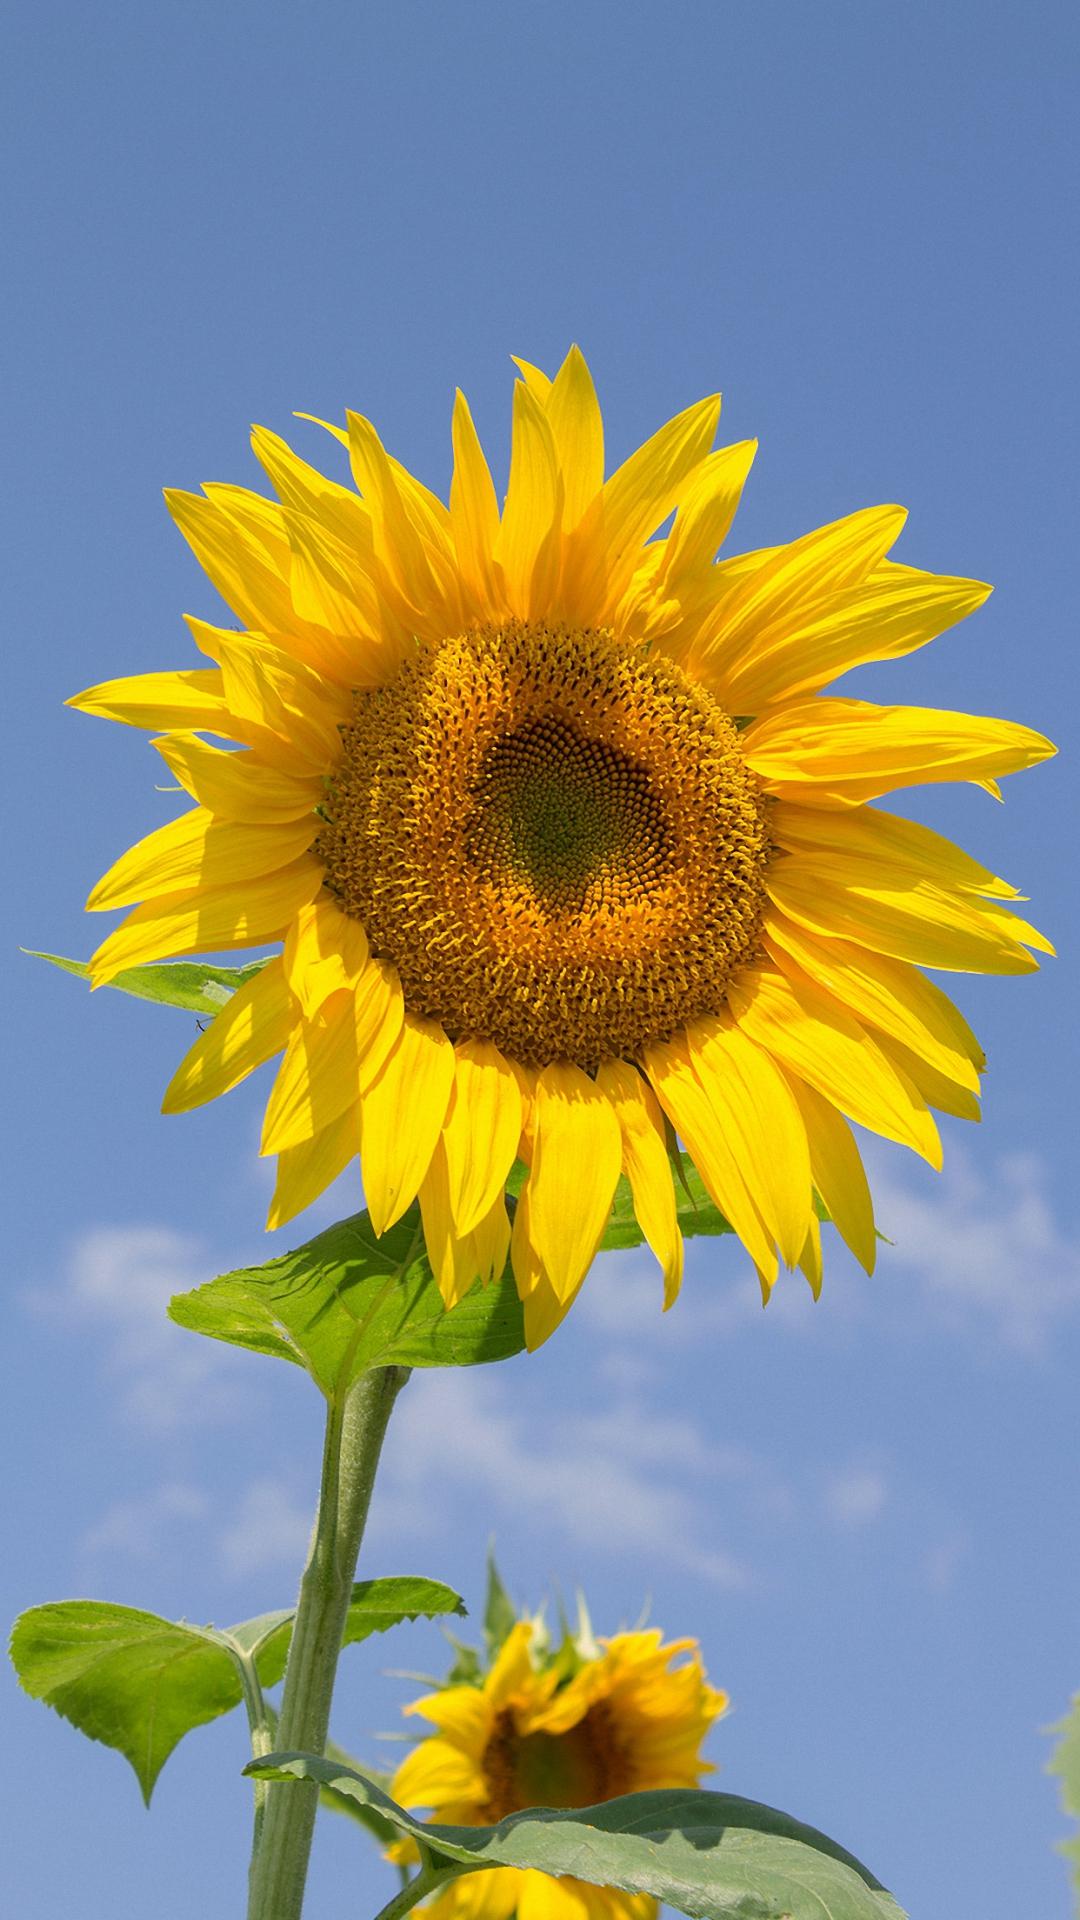 Nice Sunflower Iphone 6 Wallpapers Hd - Iphone 7 Wallpaper ...